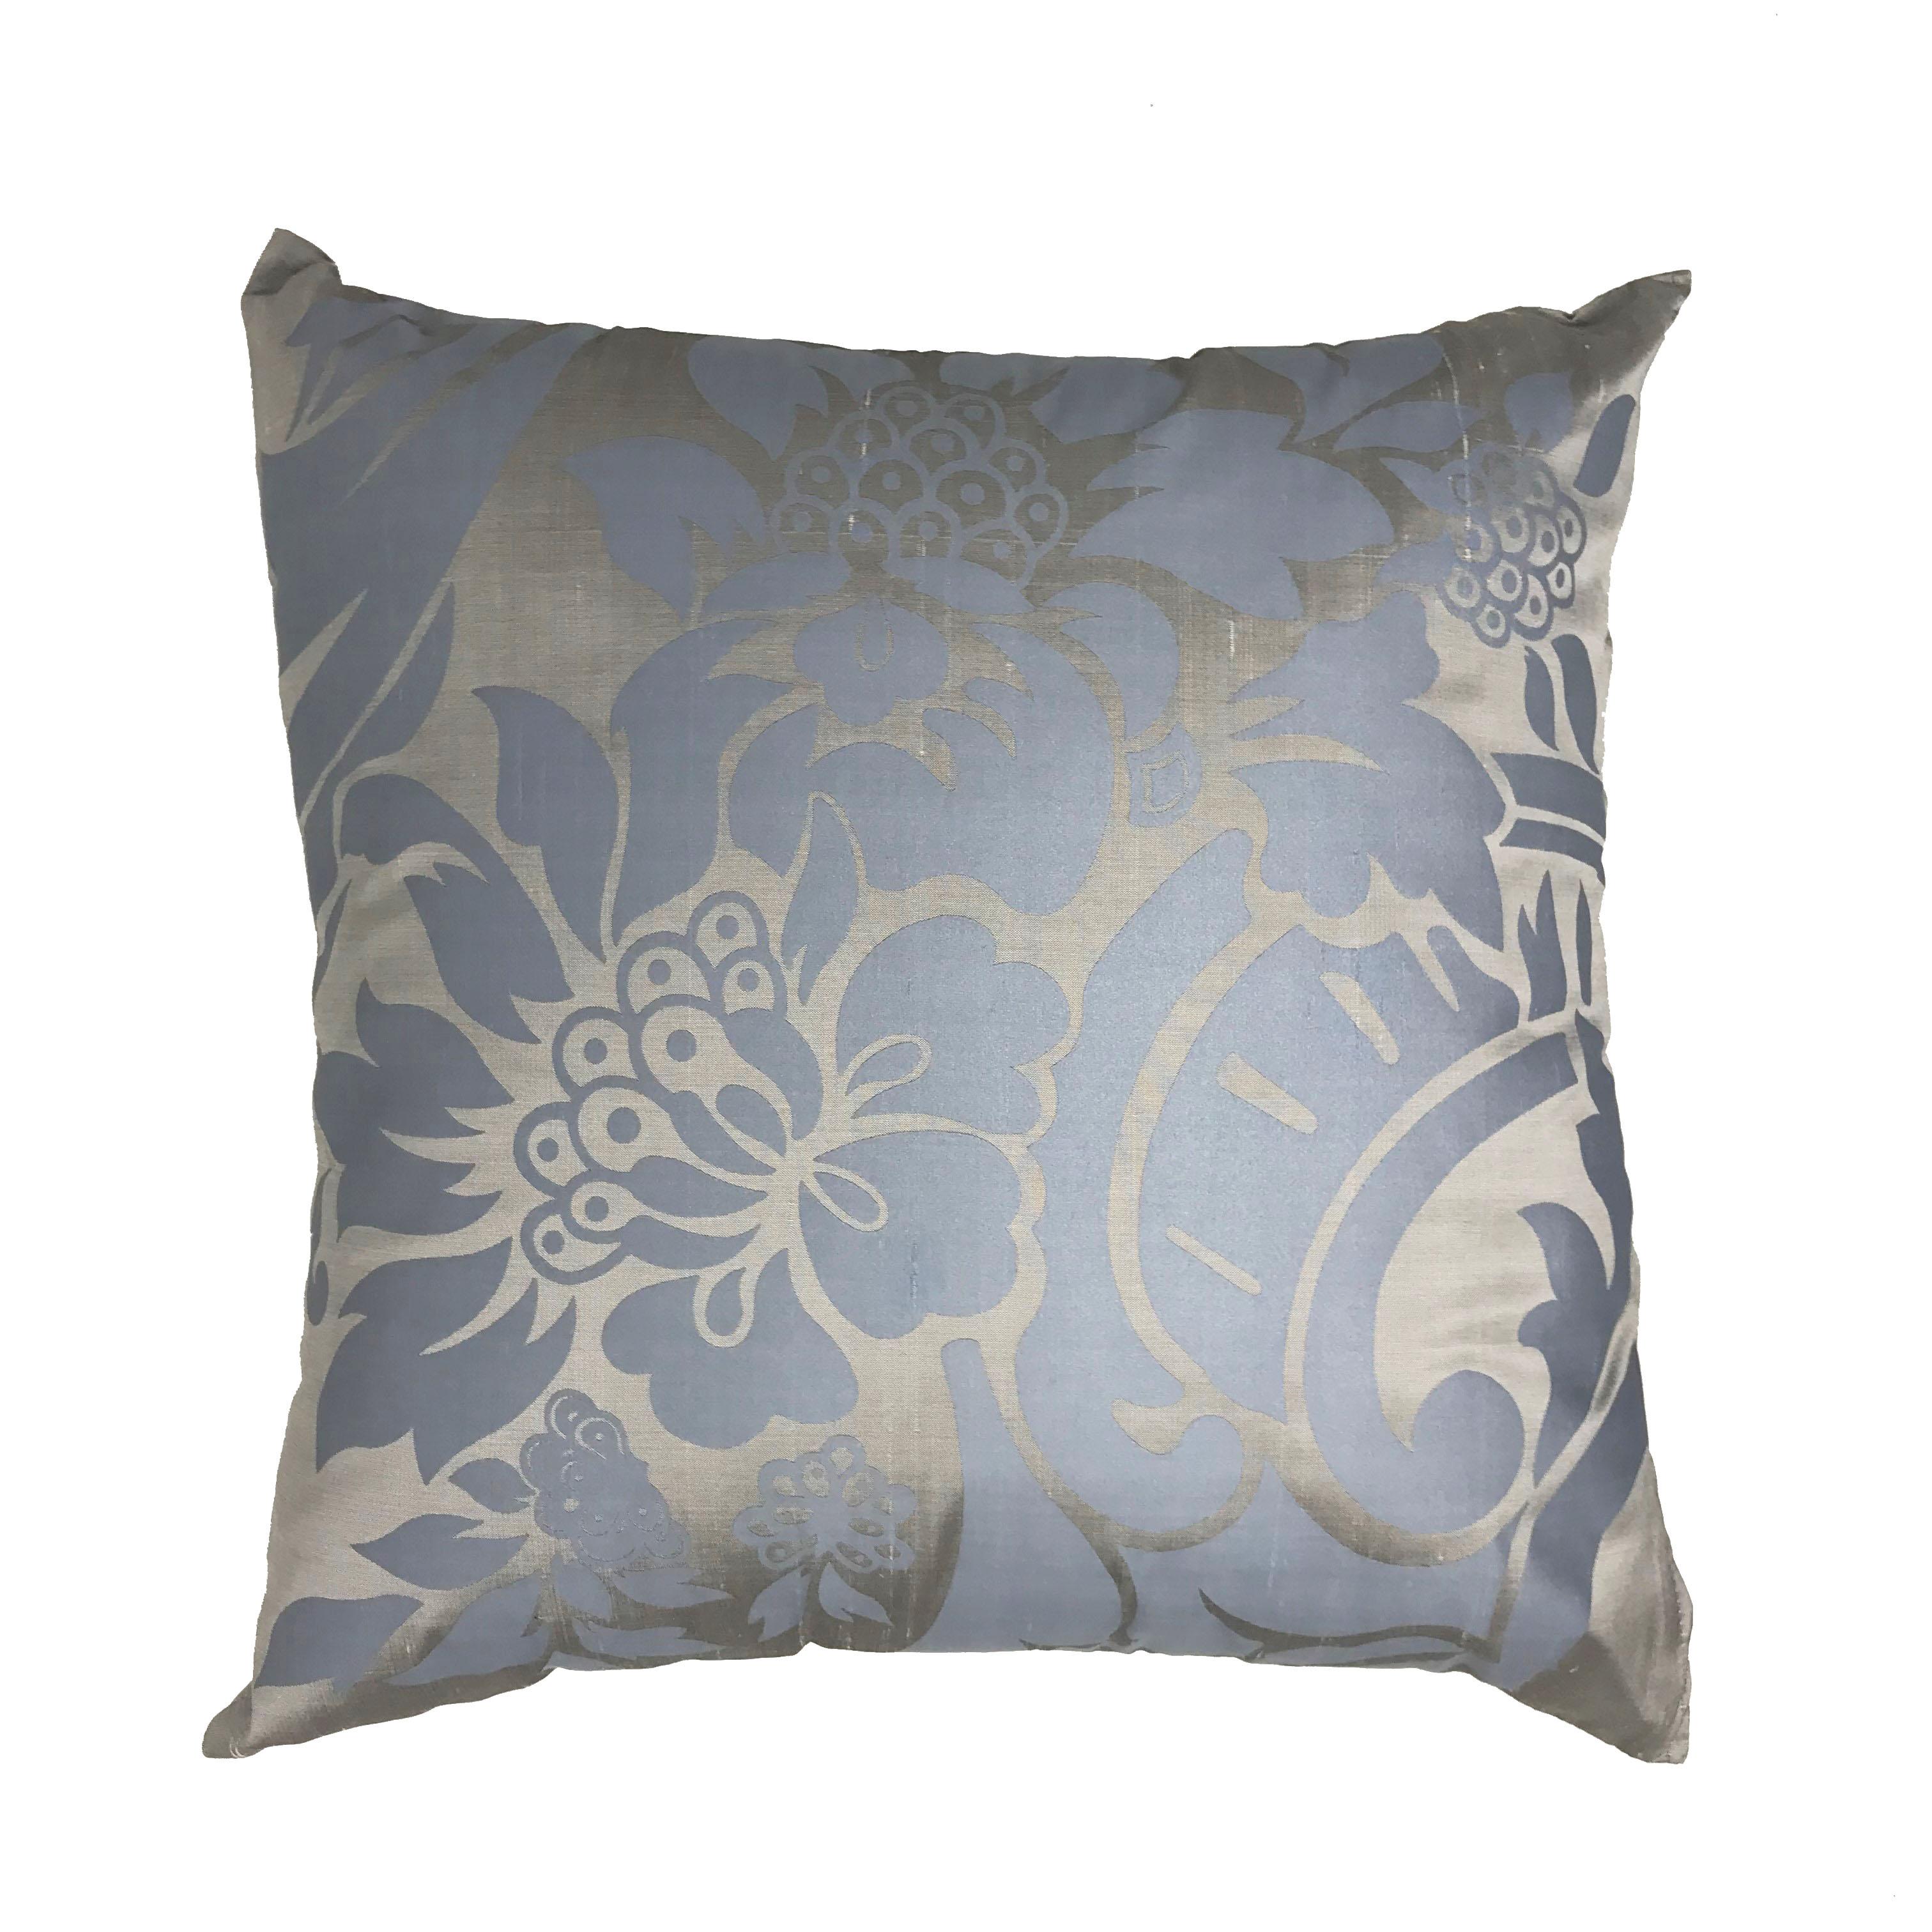 Silk Rich Silver Blue Flower Flock  40cm x 40cm Cushion Cover Only